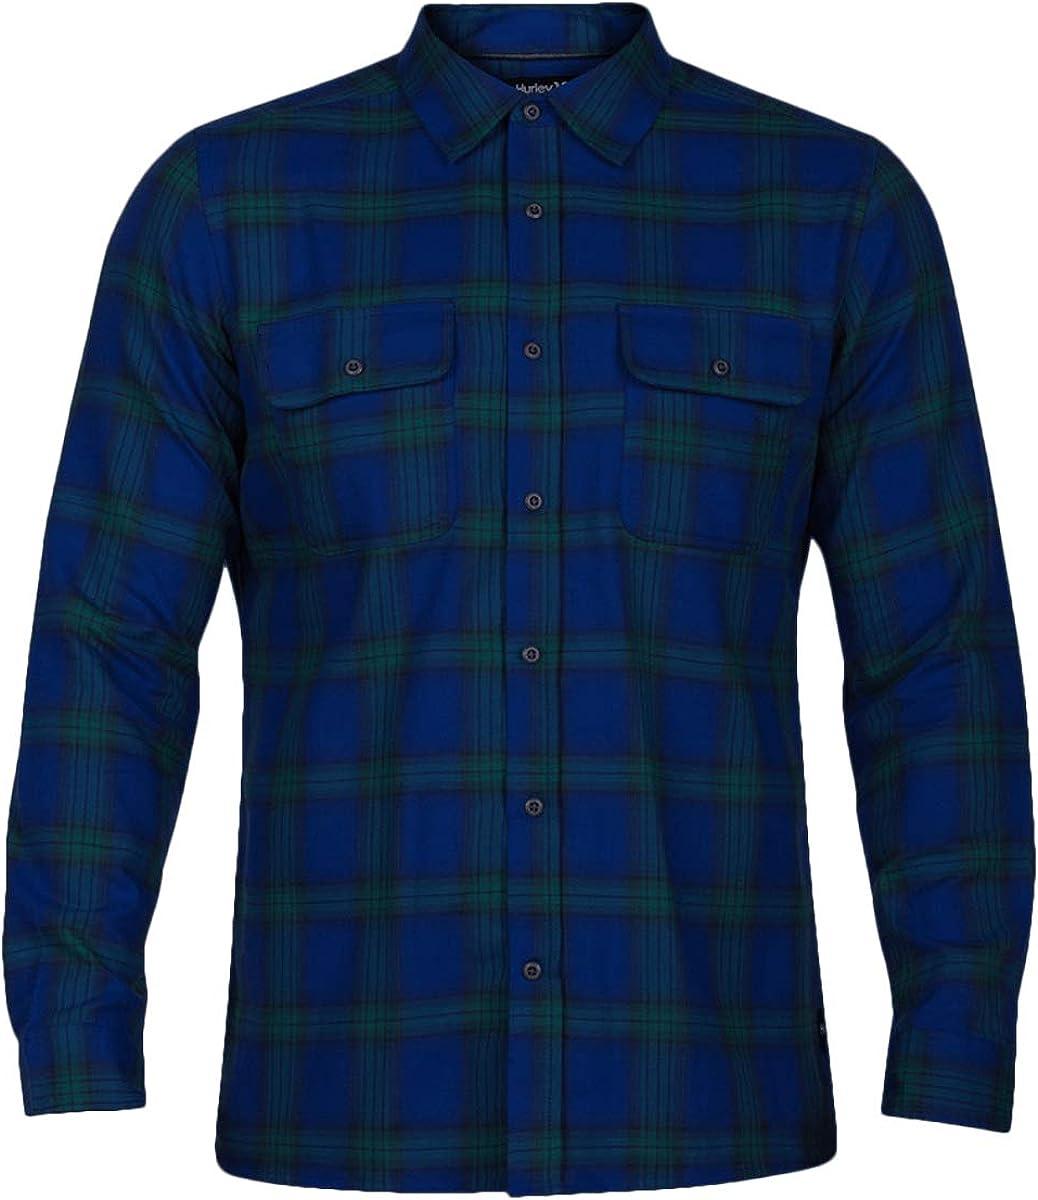 Cheap SALE Start Hurley Men's overseas Nike Dri Fit Syd Plaid Shirt Woven Long Sleeve